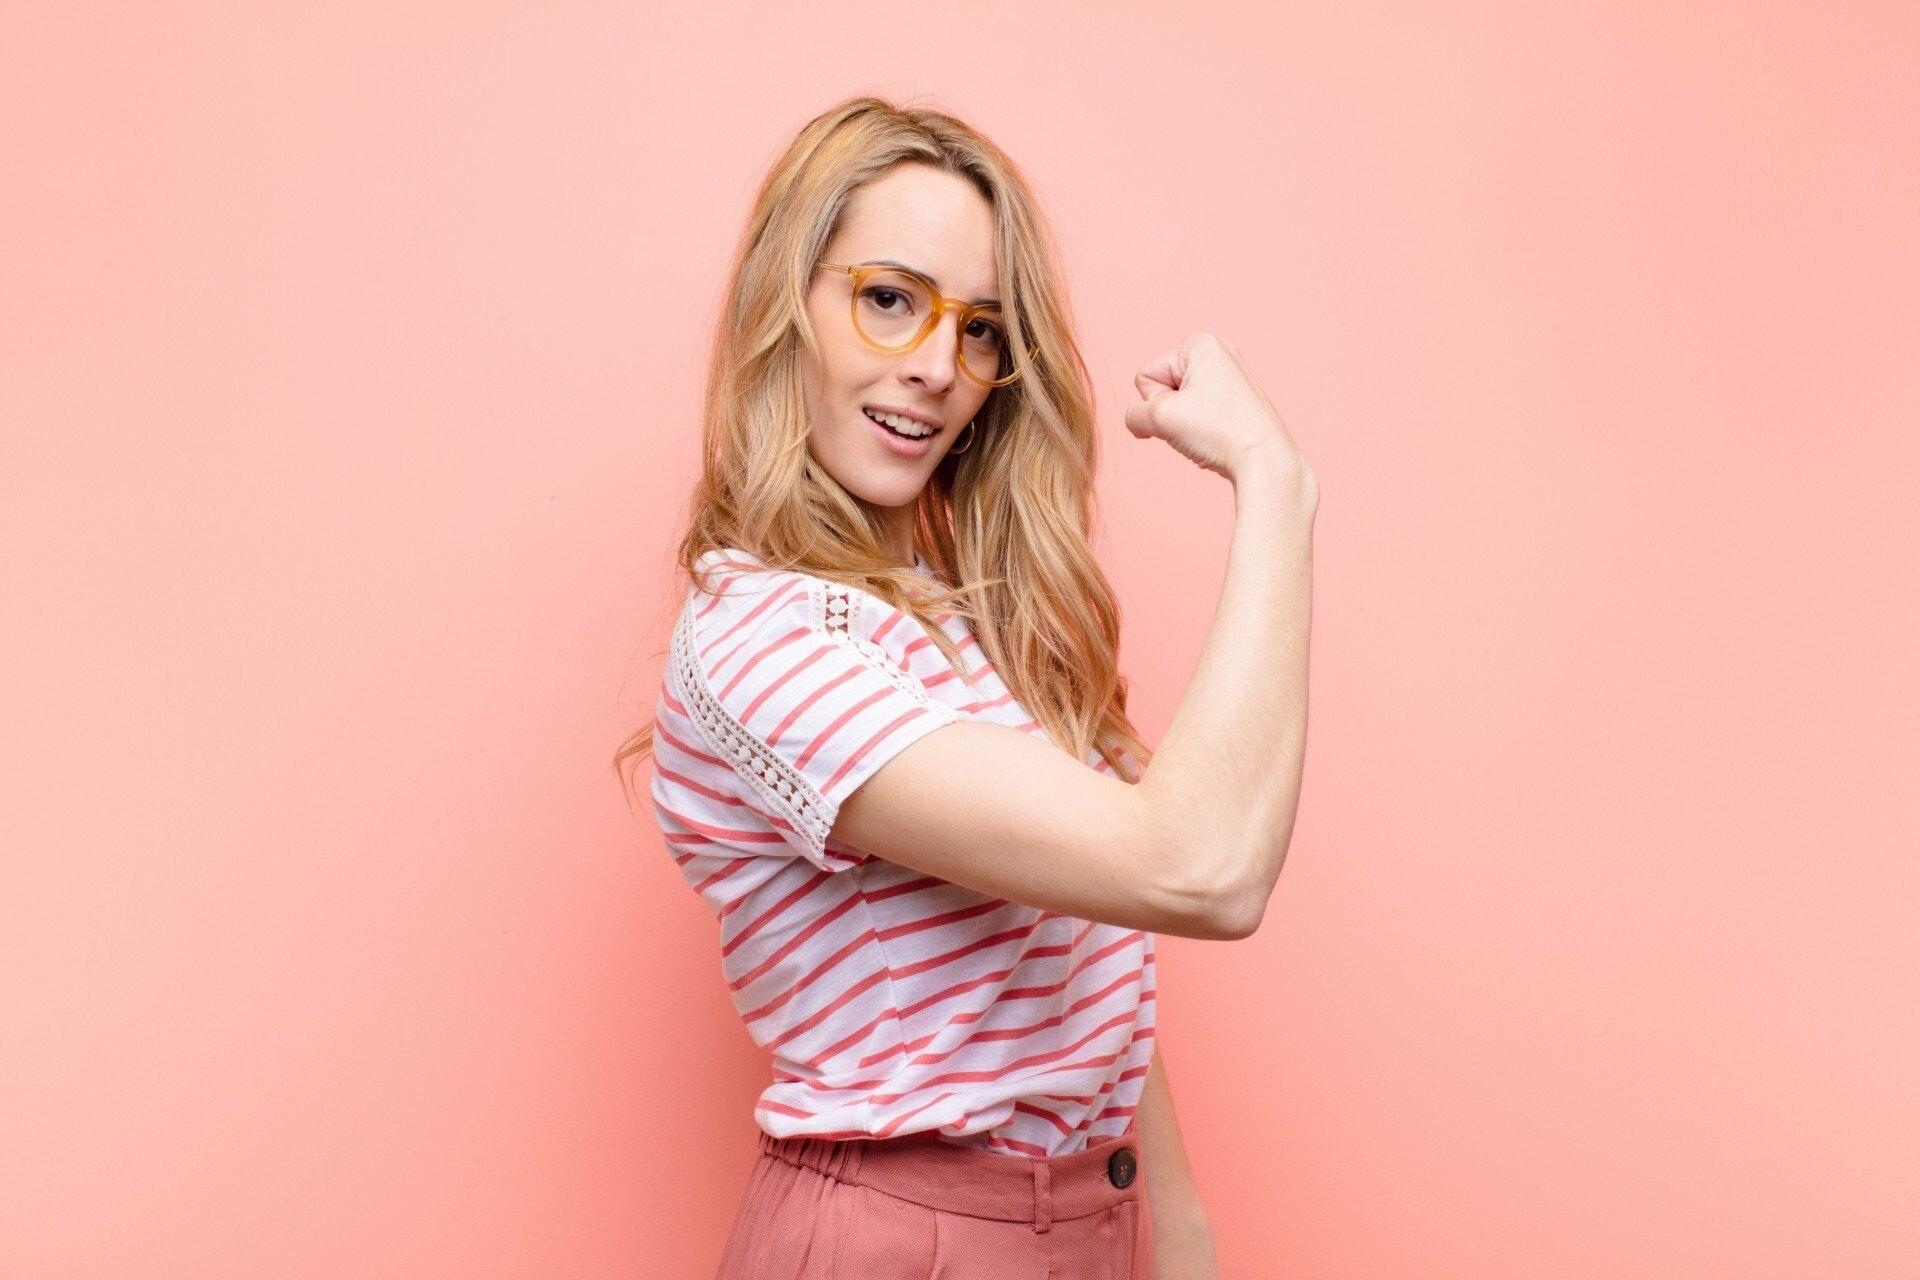 Atlanta's Top Arm Fat Surgery: Skip the Invasive Arm Liposuction